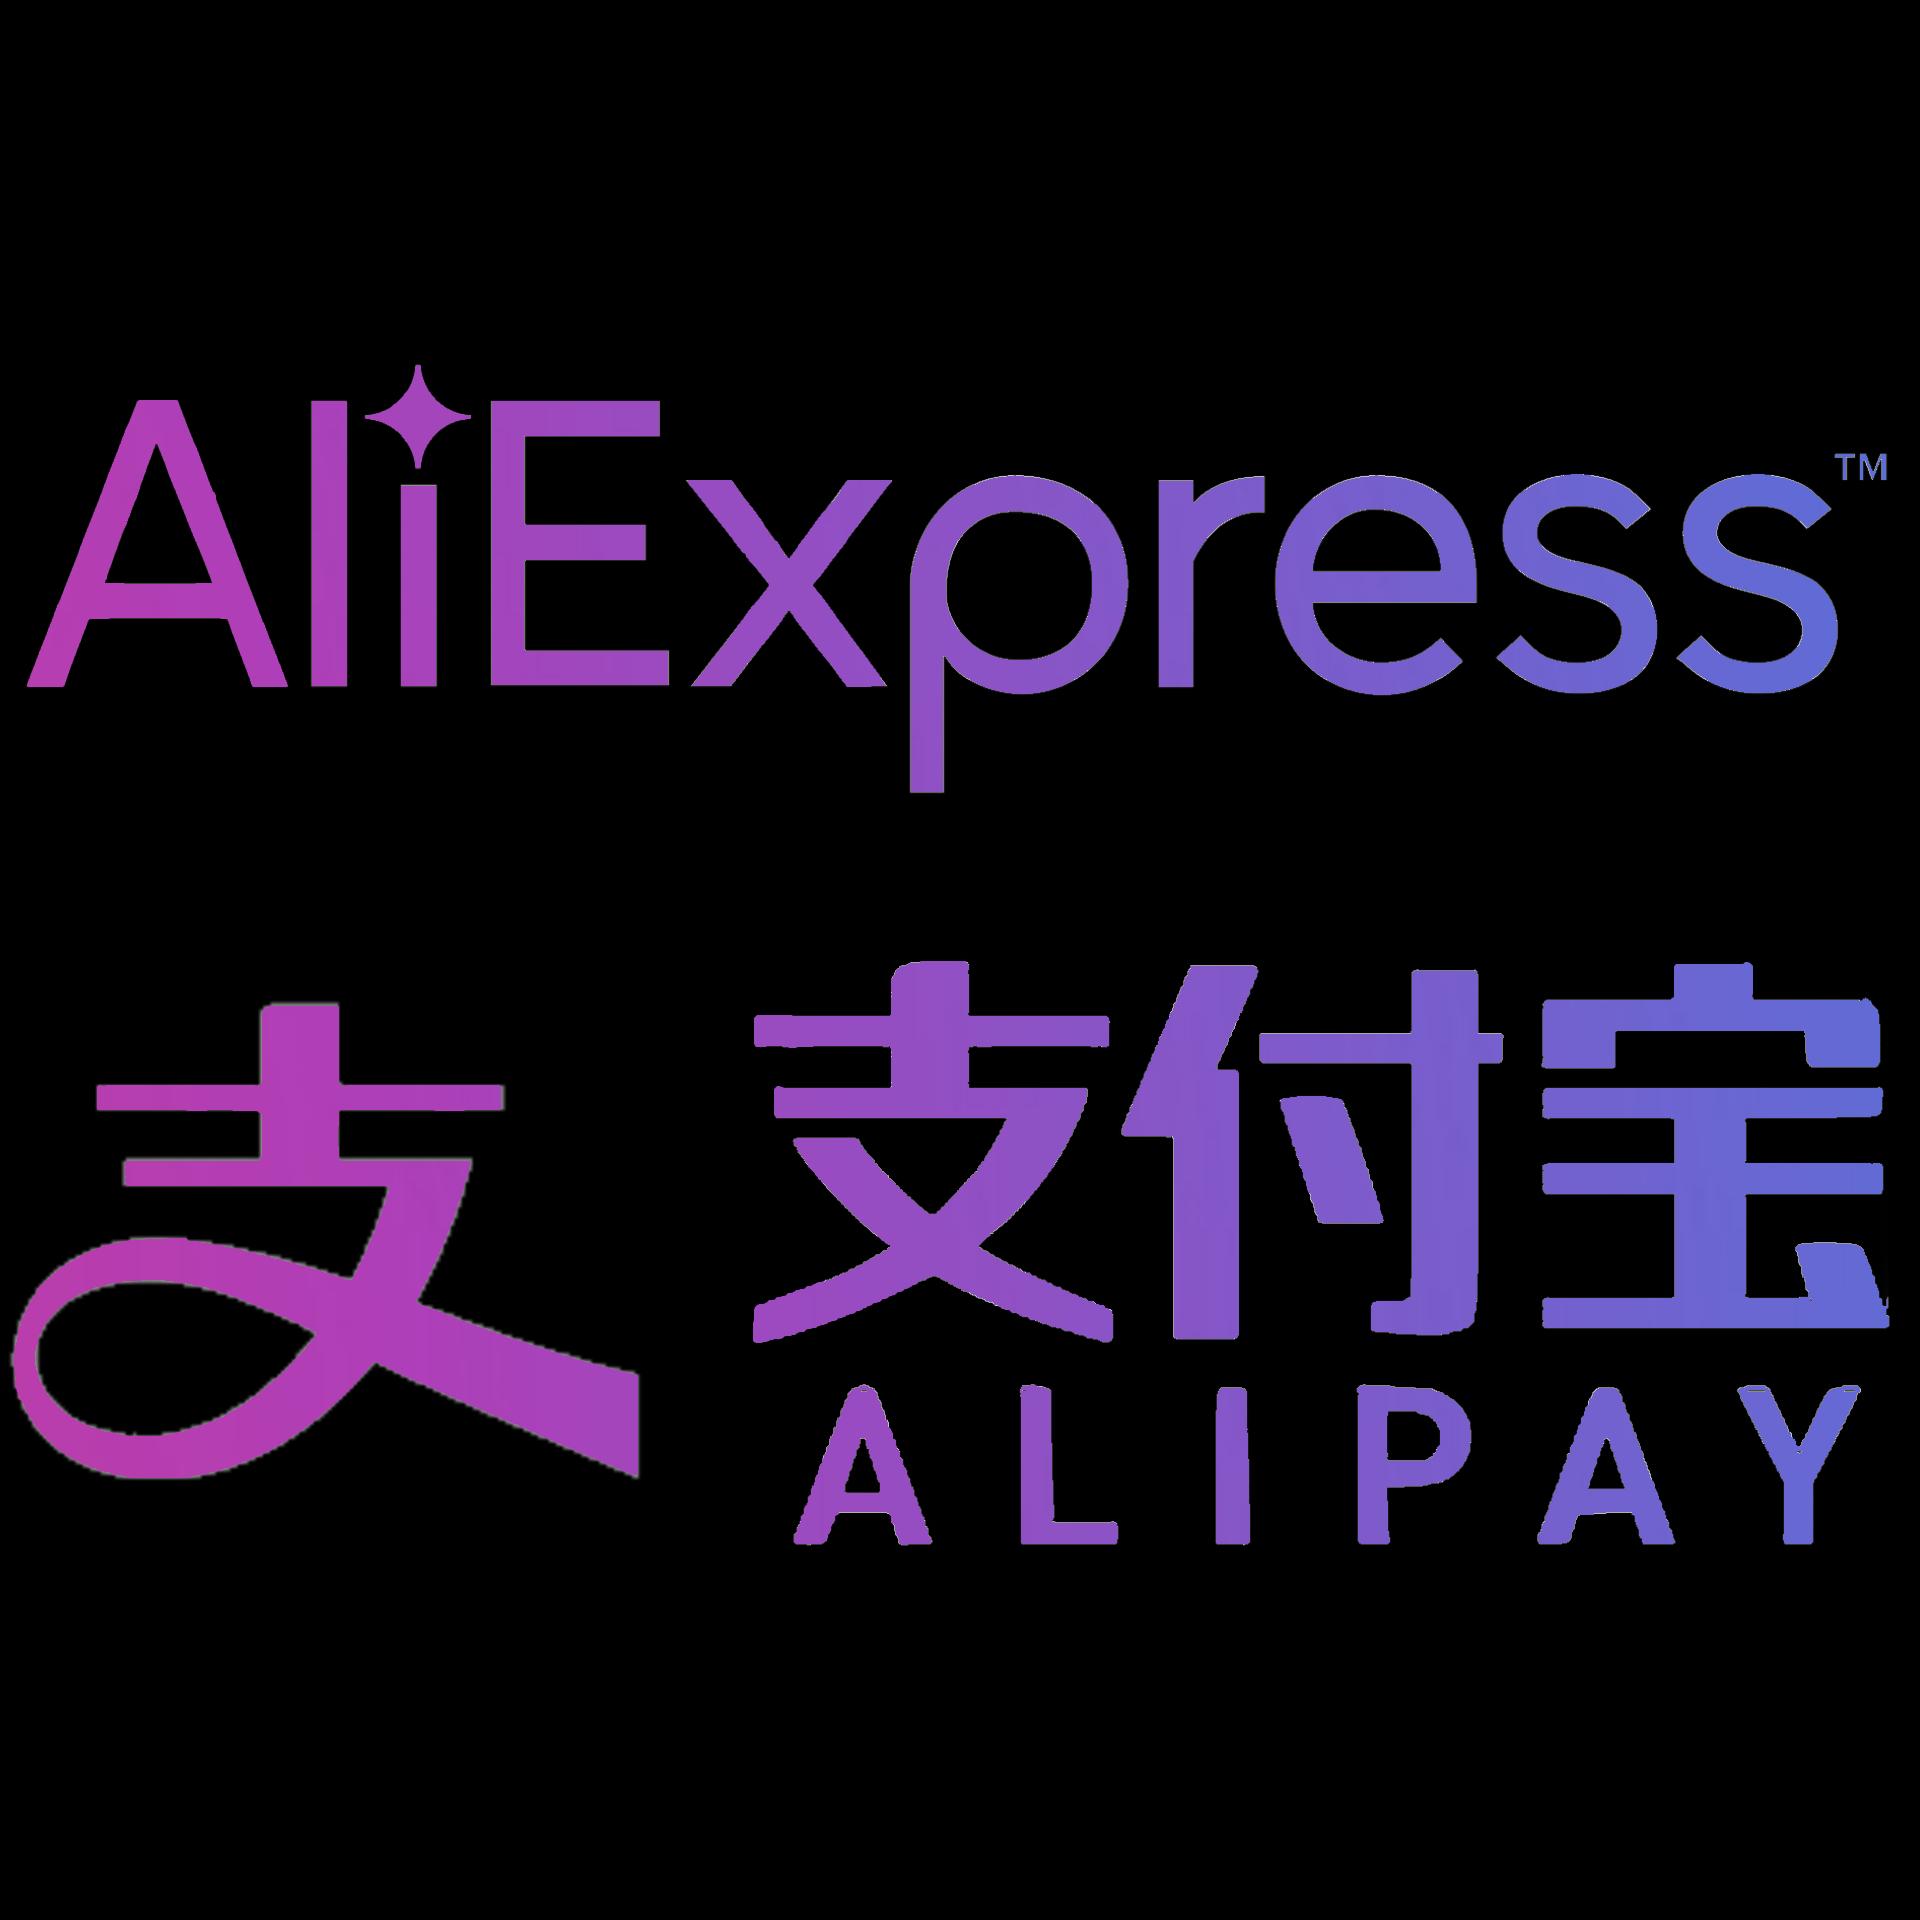 [11.11] AliExpress via AliPay: 2€ ab 20€ Sofortrabatt / via PayPal: $2 ab $20 Sofortrabatt (Kombinierbar mit GS)